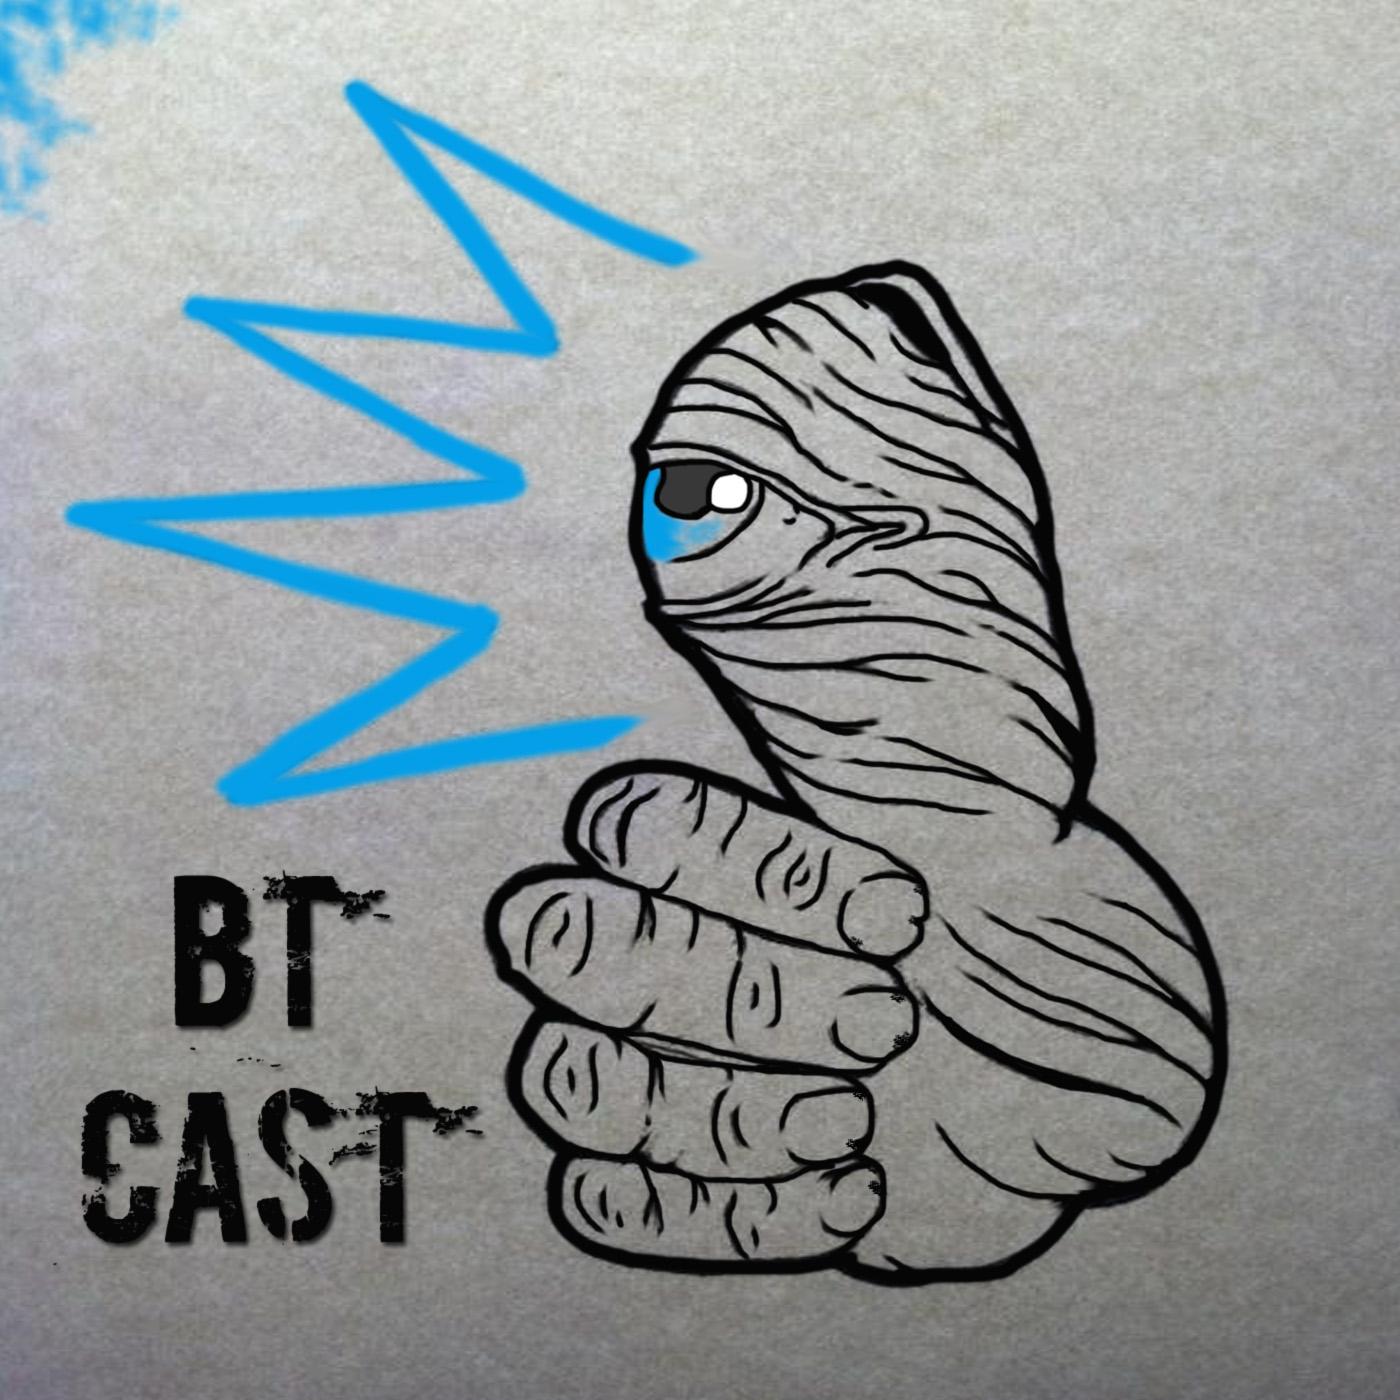 BT-Cast_logo.jpg